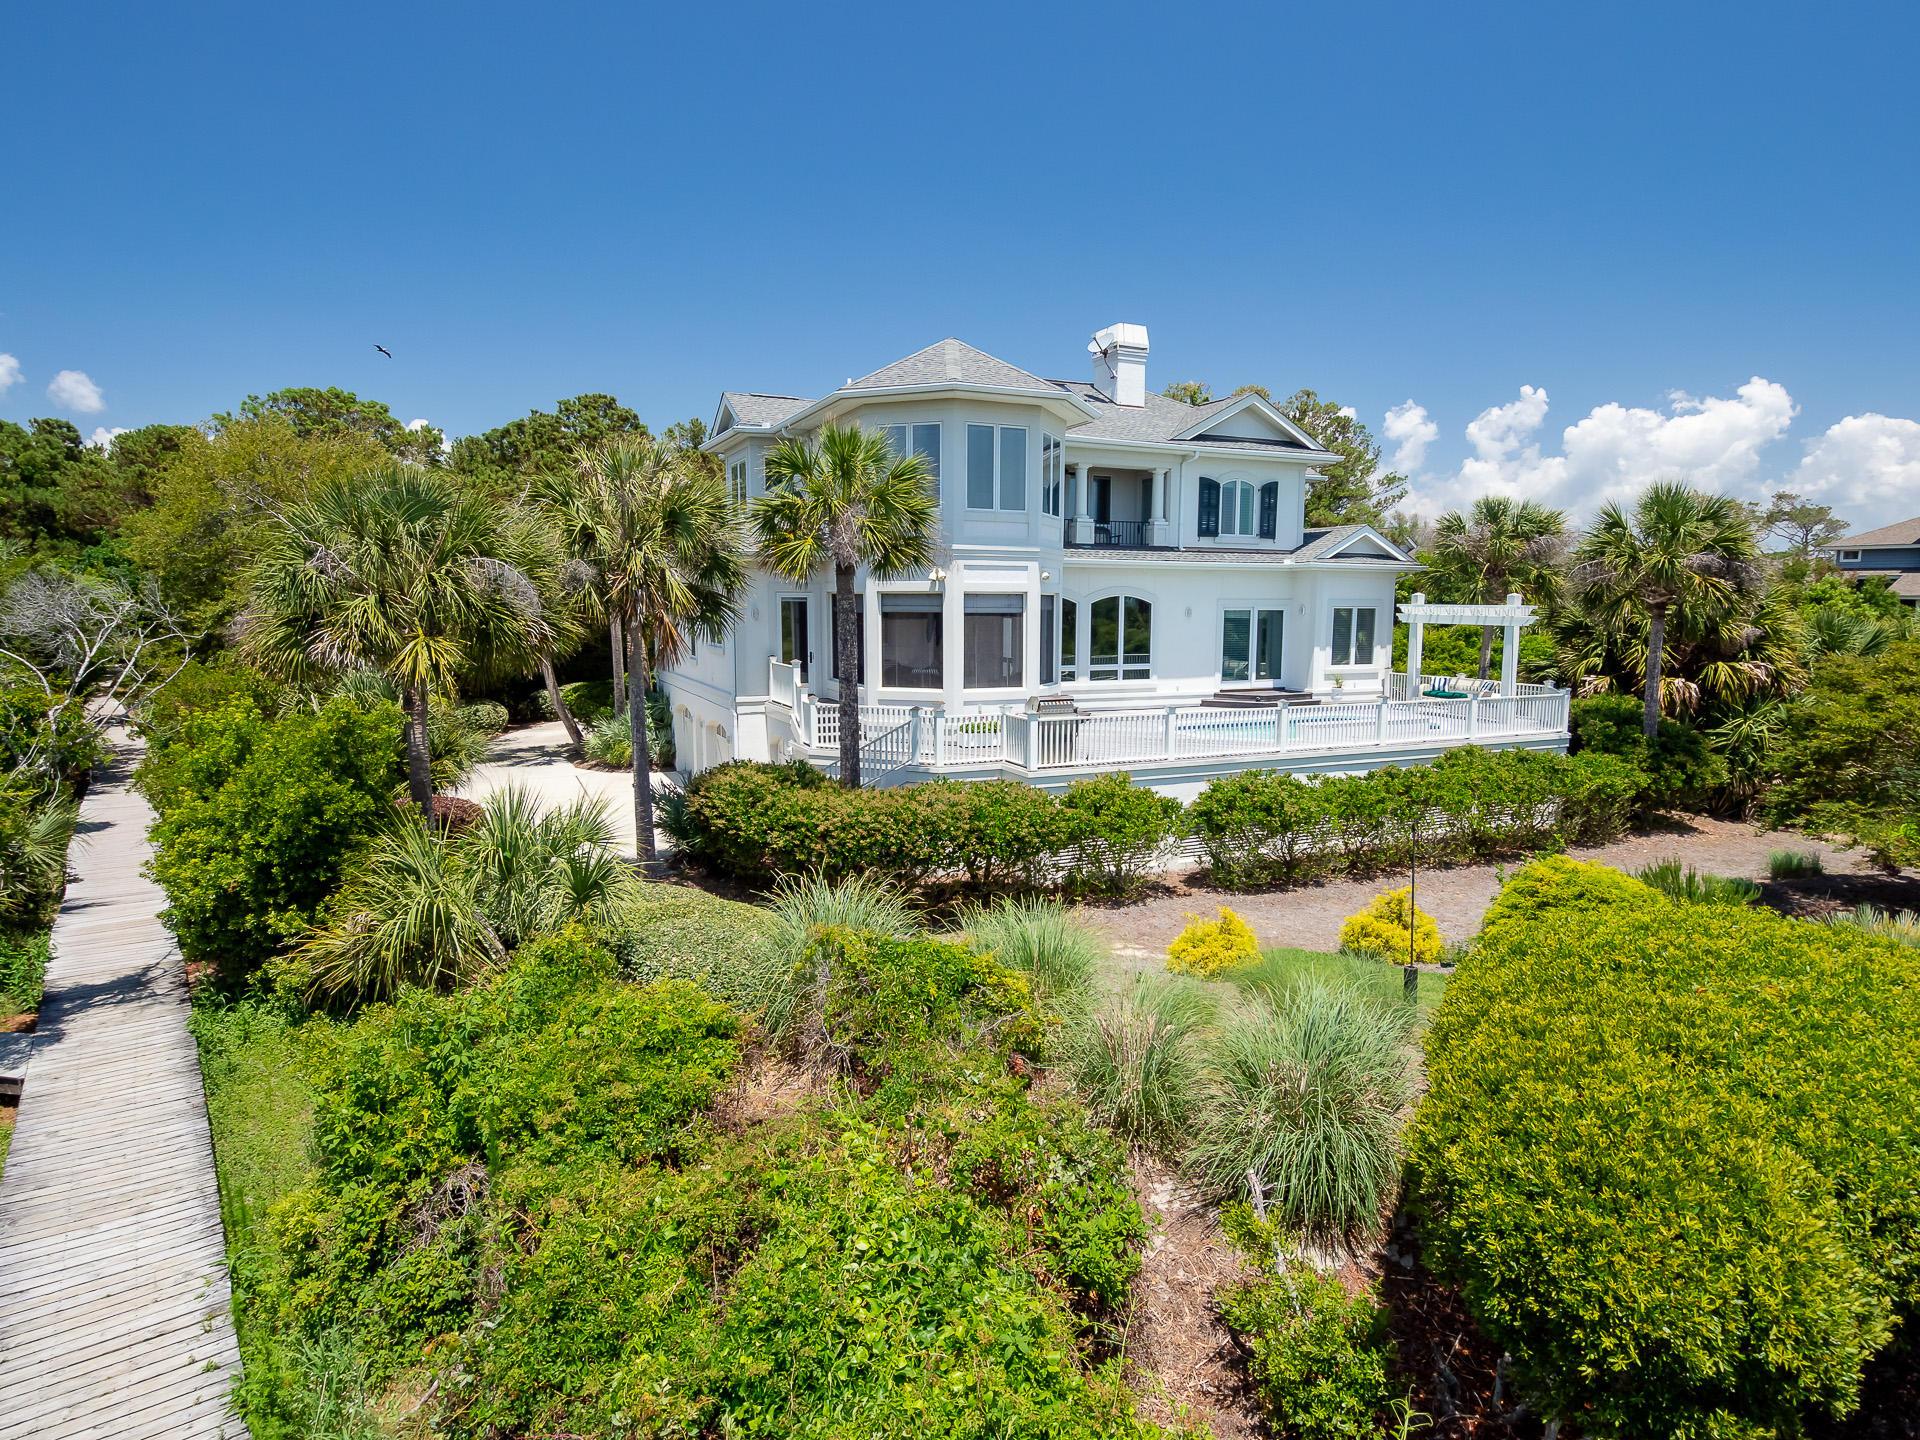 Seabrook Island Homes For Sale - 2216 Rolling Dune, Seabrook Island, SC - 52